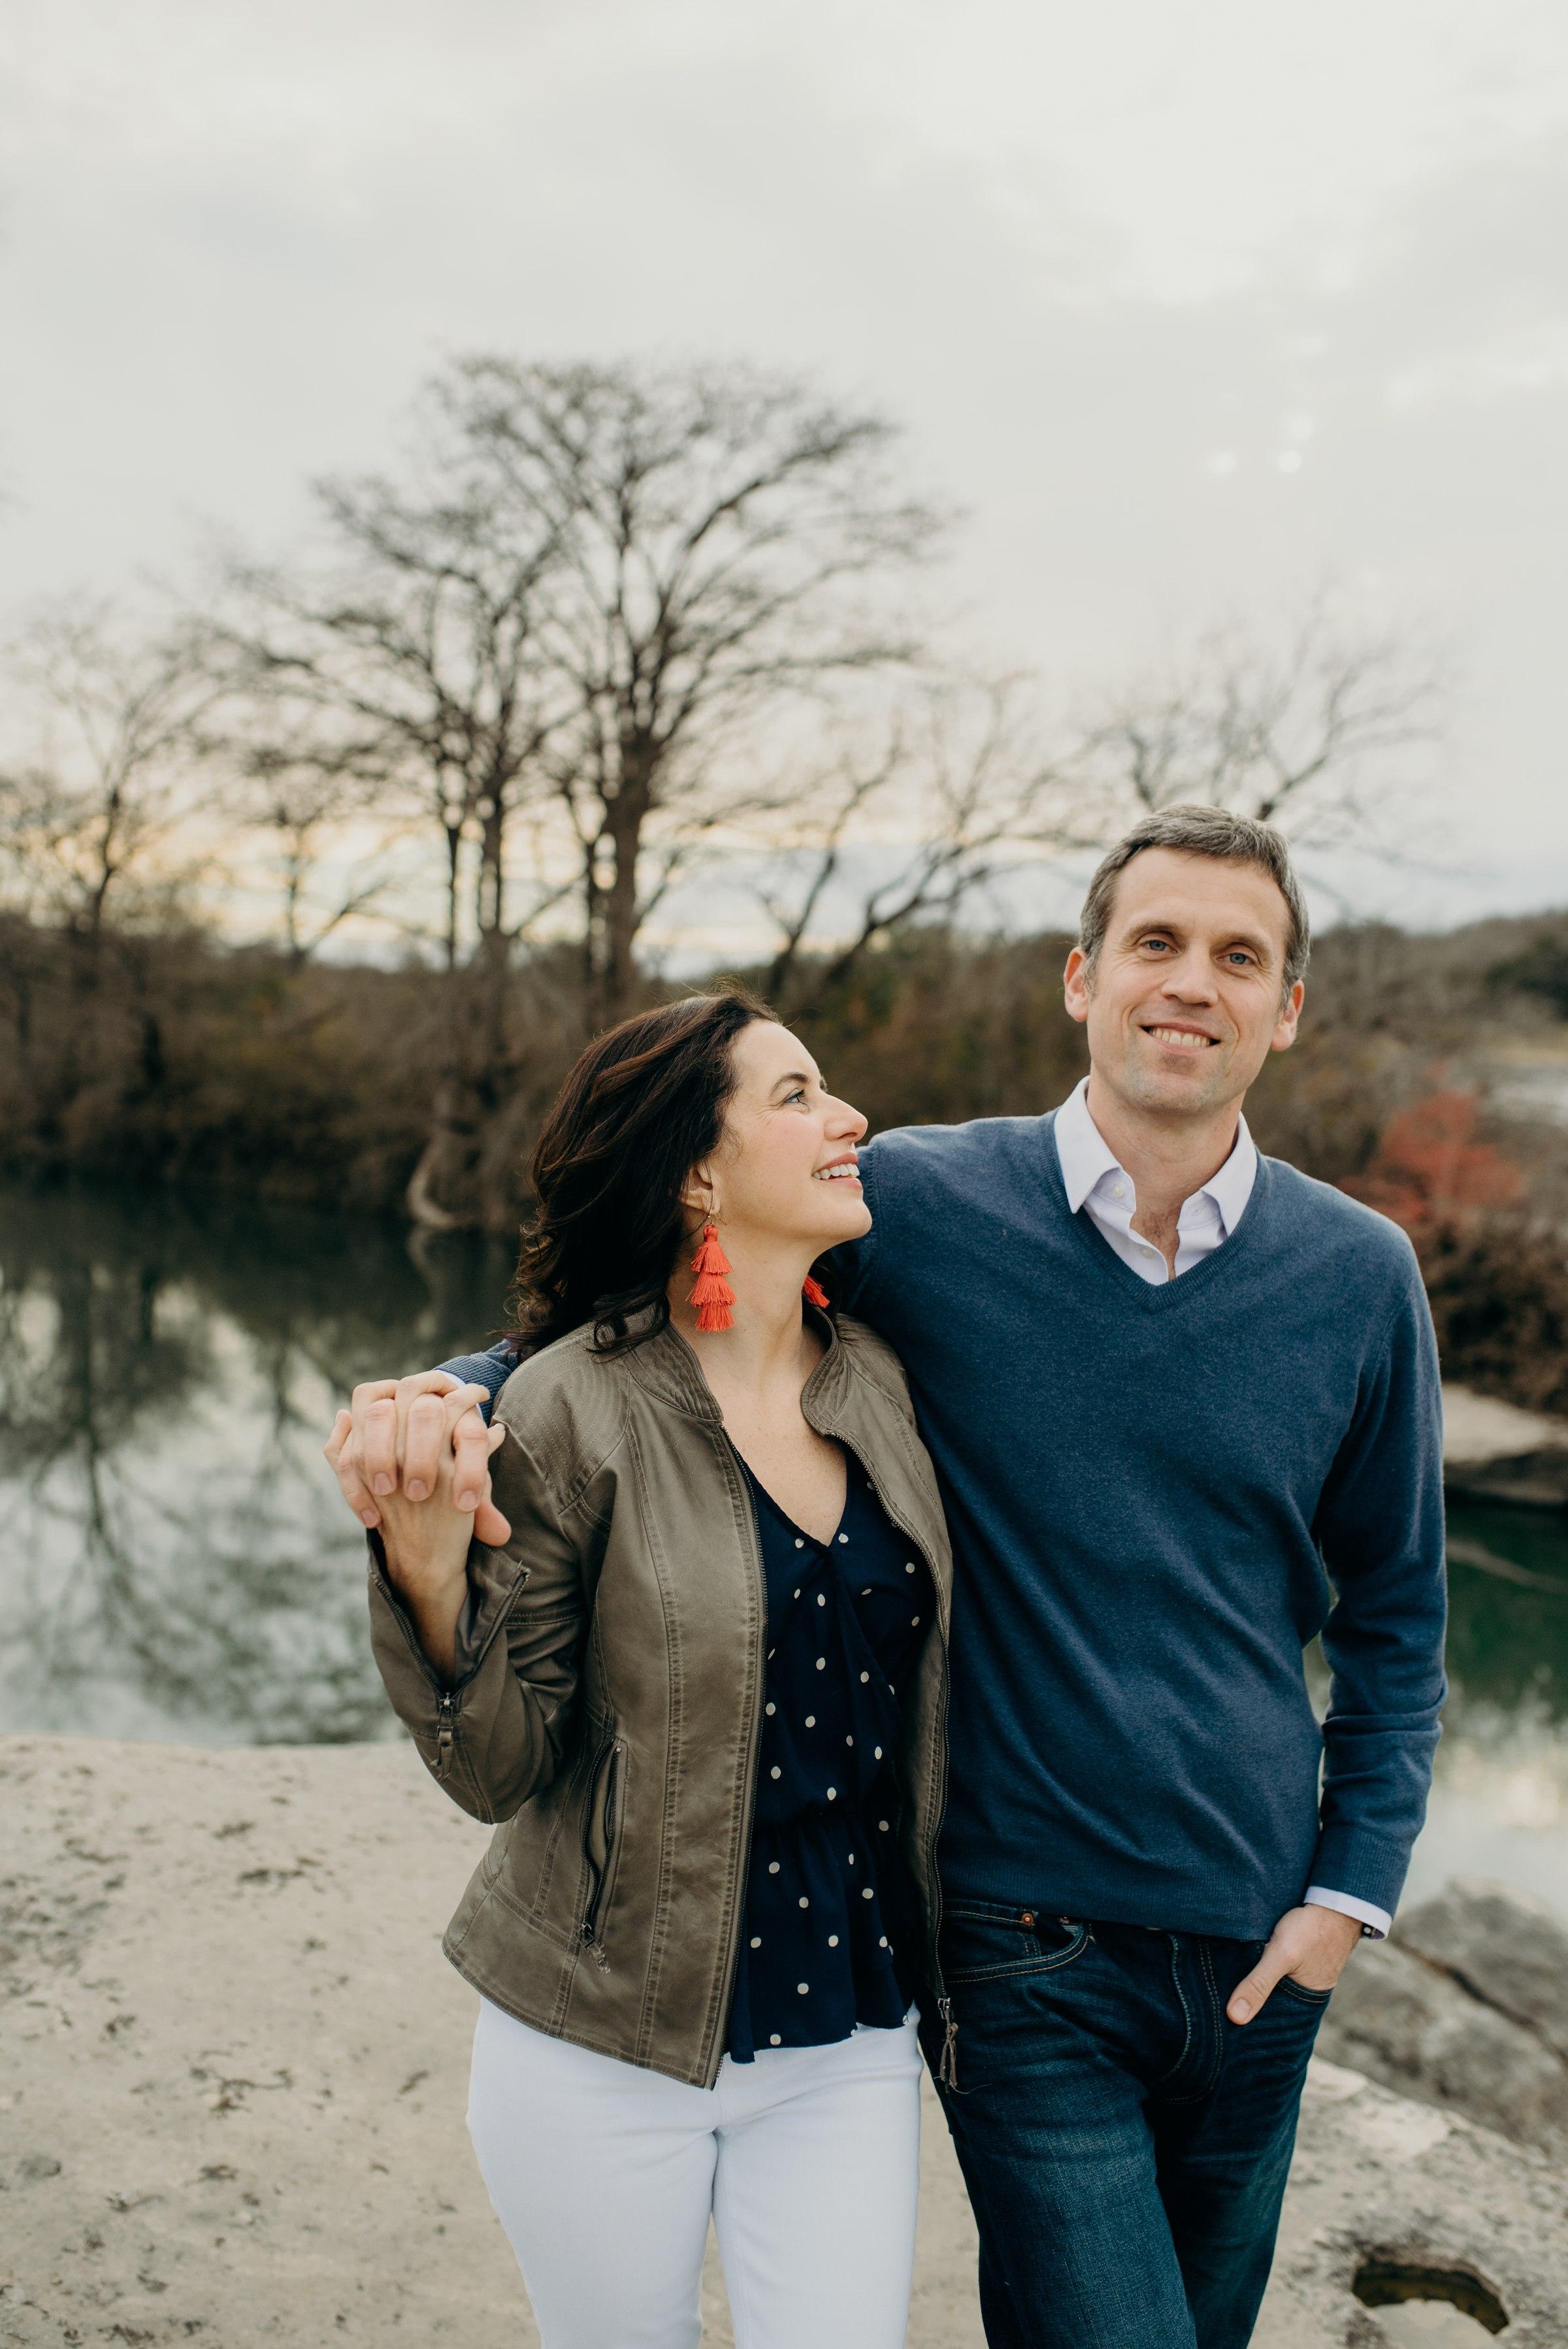 austin-mckinney-falls-engagement-photographer-elopement-prices-best-headshot-senior-adventurous-italy-minneapolis-texas-minnesota-dallas-houston-tulum-mexico_0032.jpg